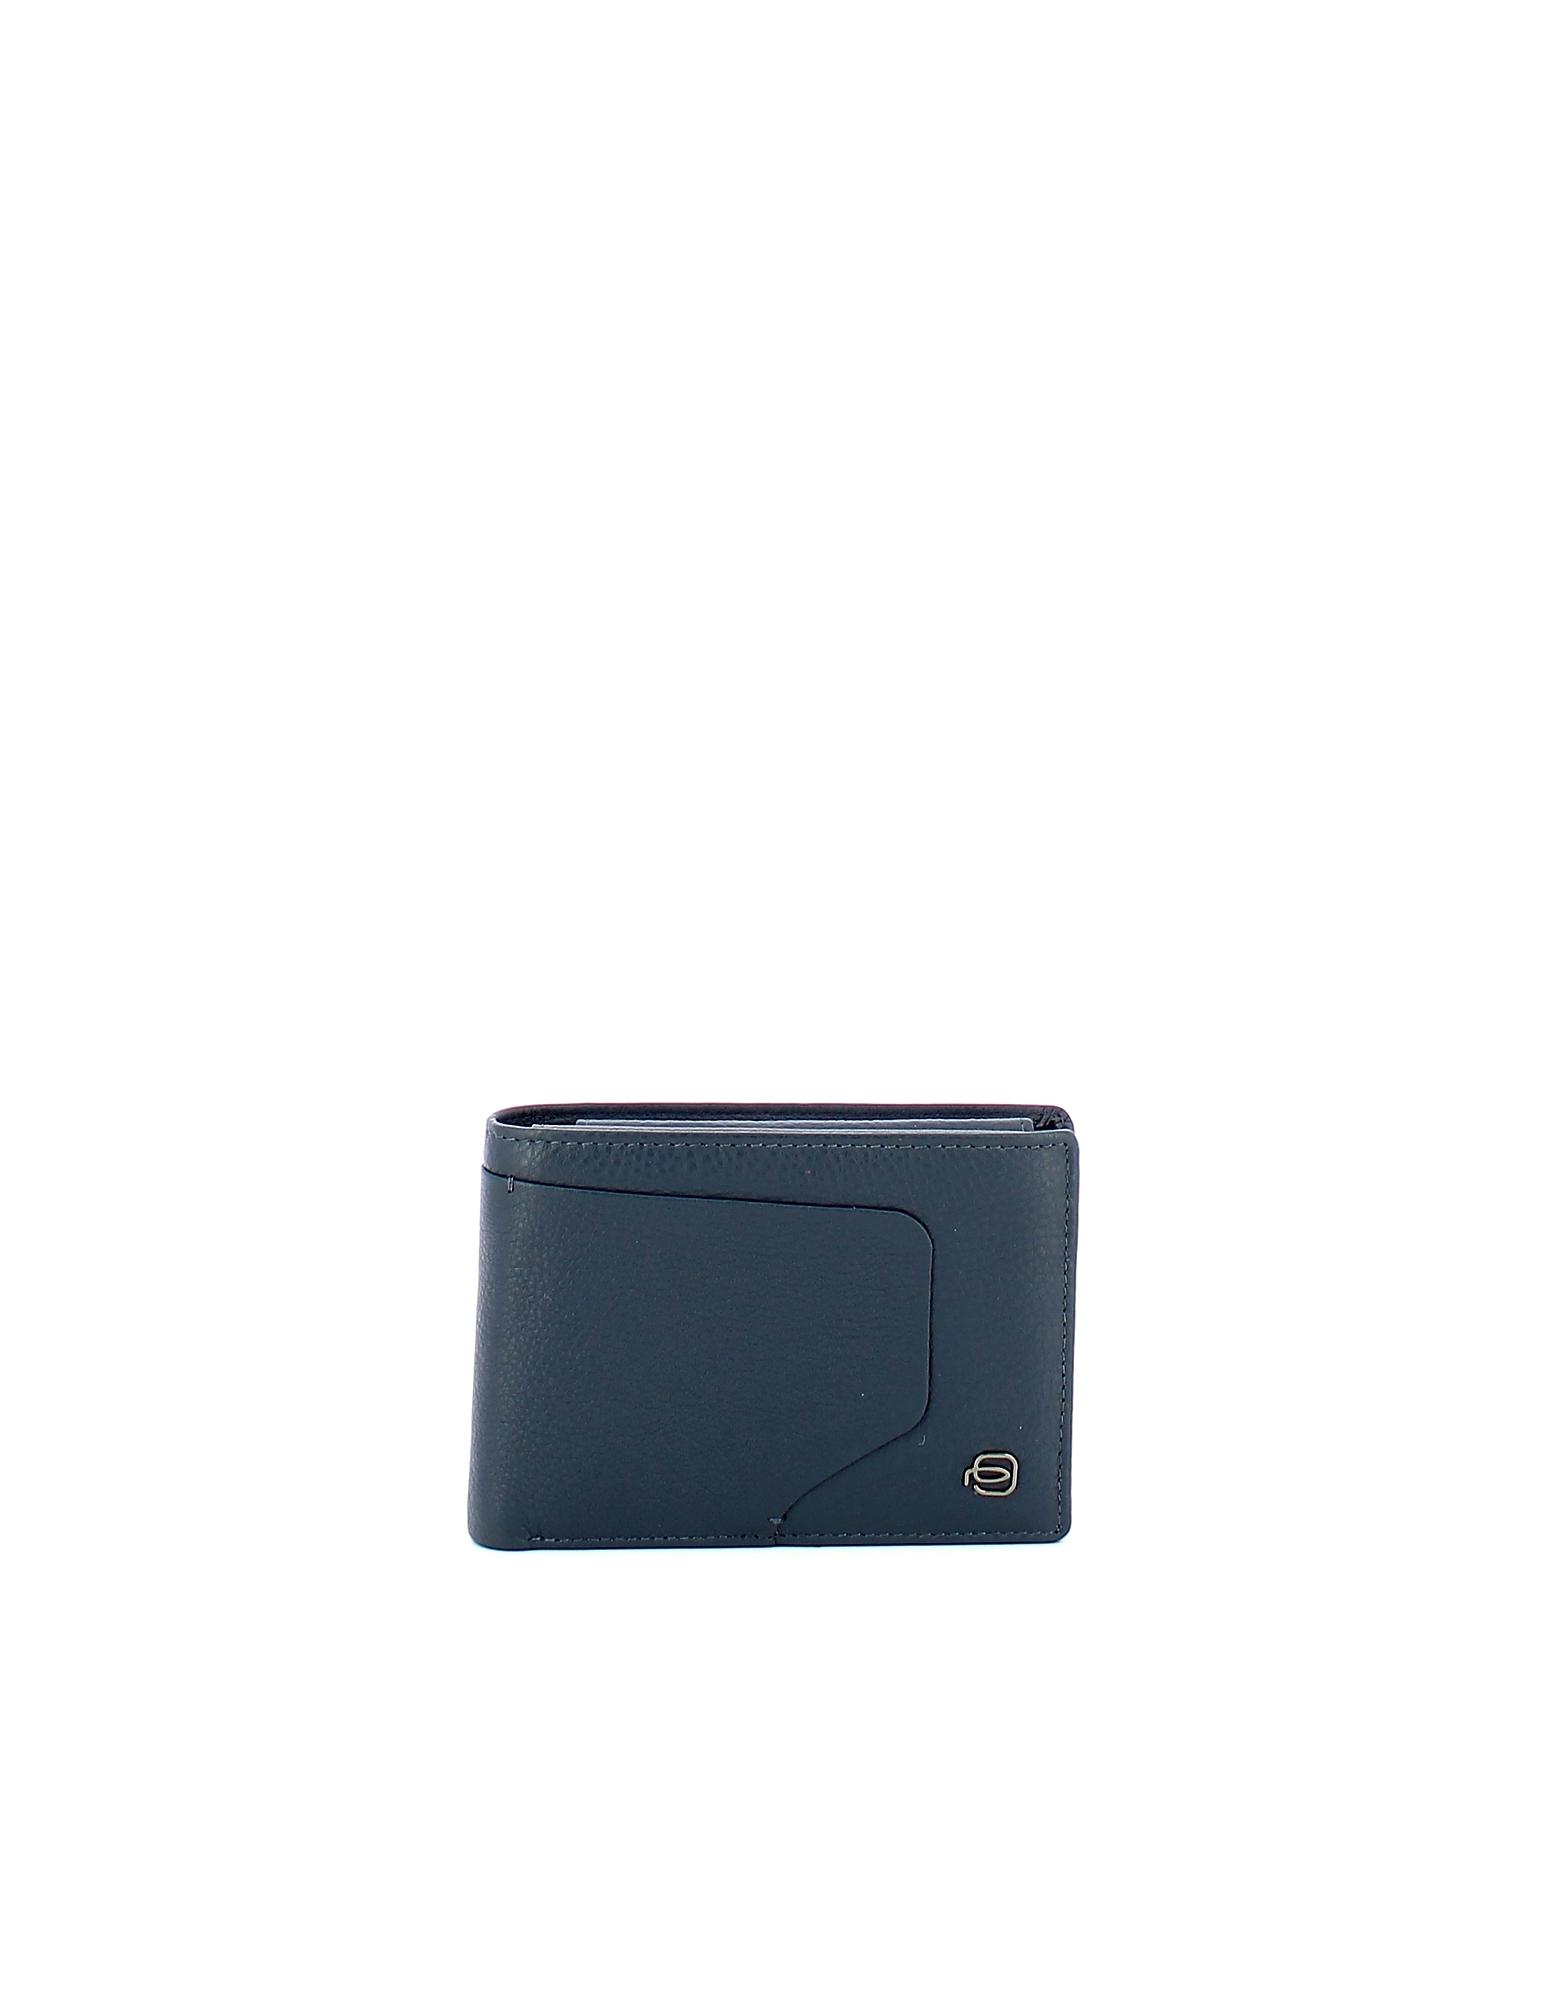 Piquadro Designer Men's Bags, Men's Blue Wallet